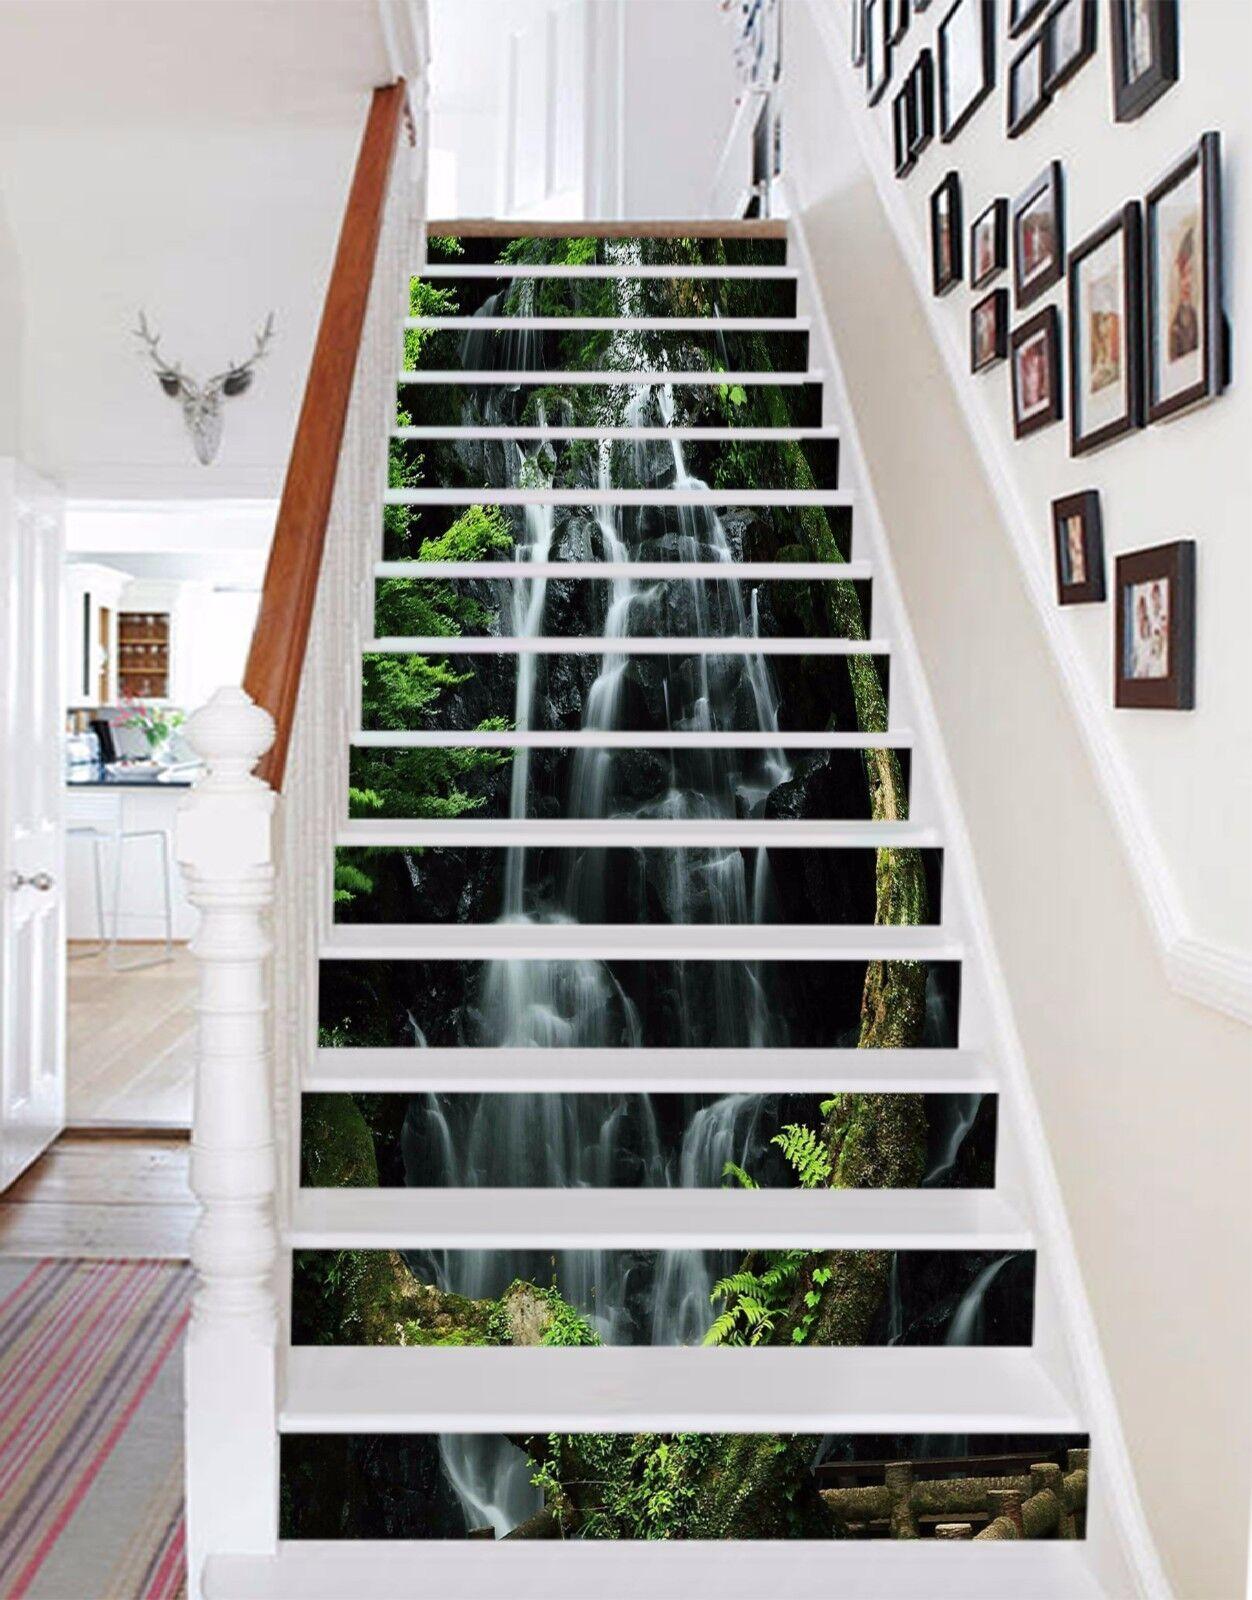 3D Falls Streams 08 Stair Risers Decoration Photo Mural Vinyl Decal WandPapier UK